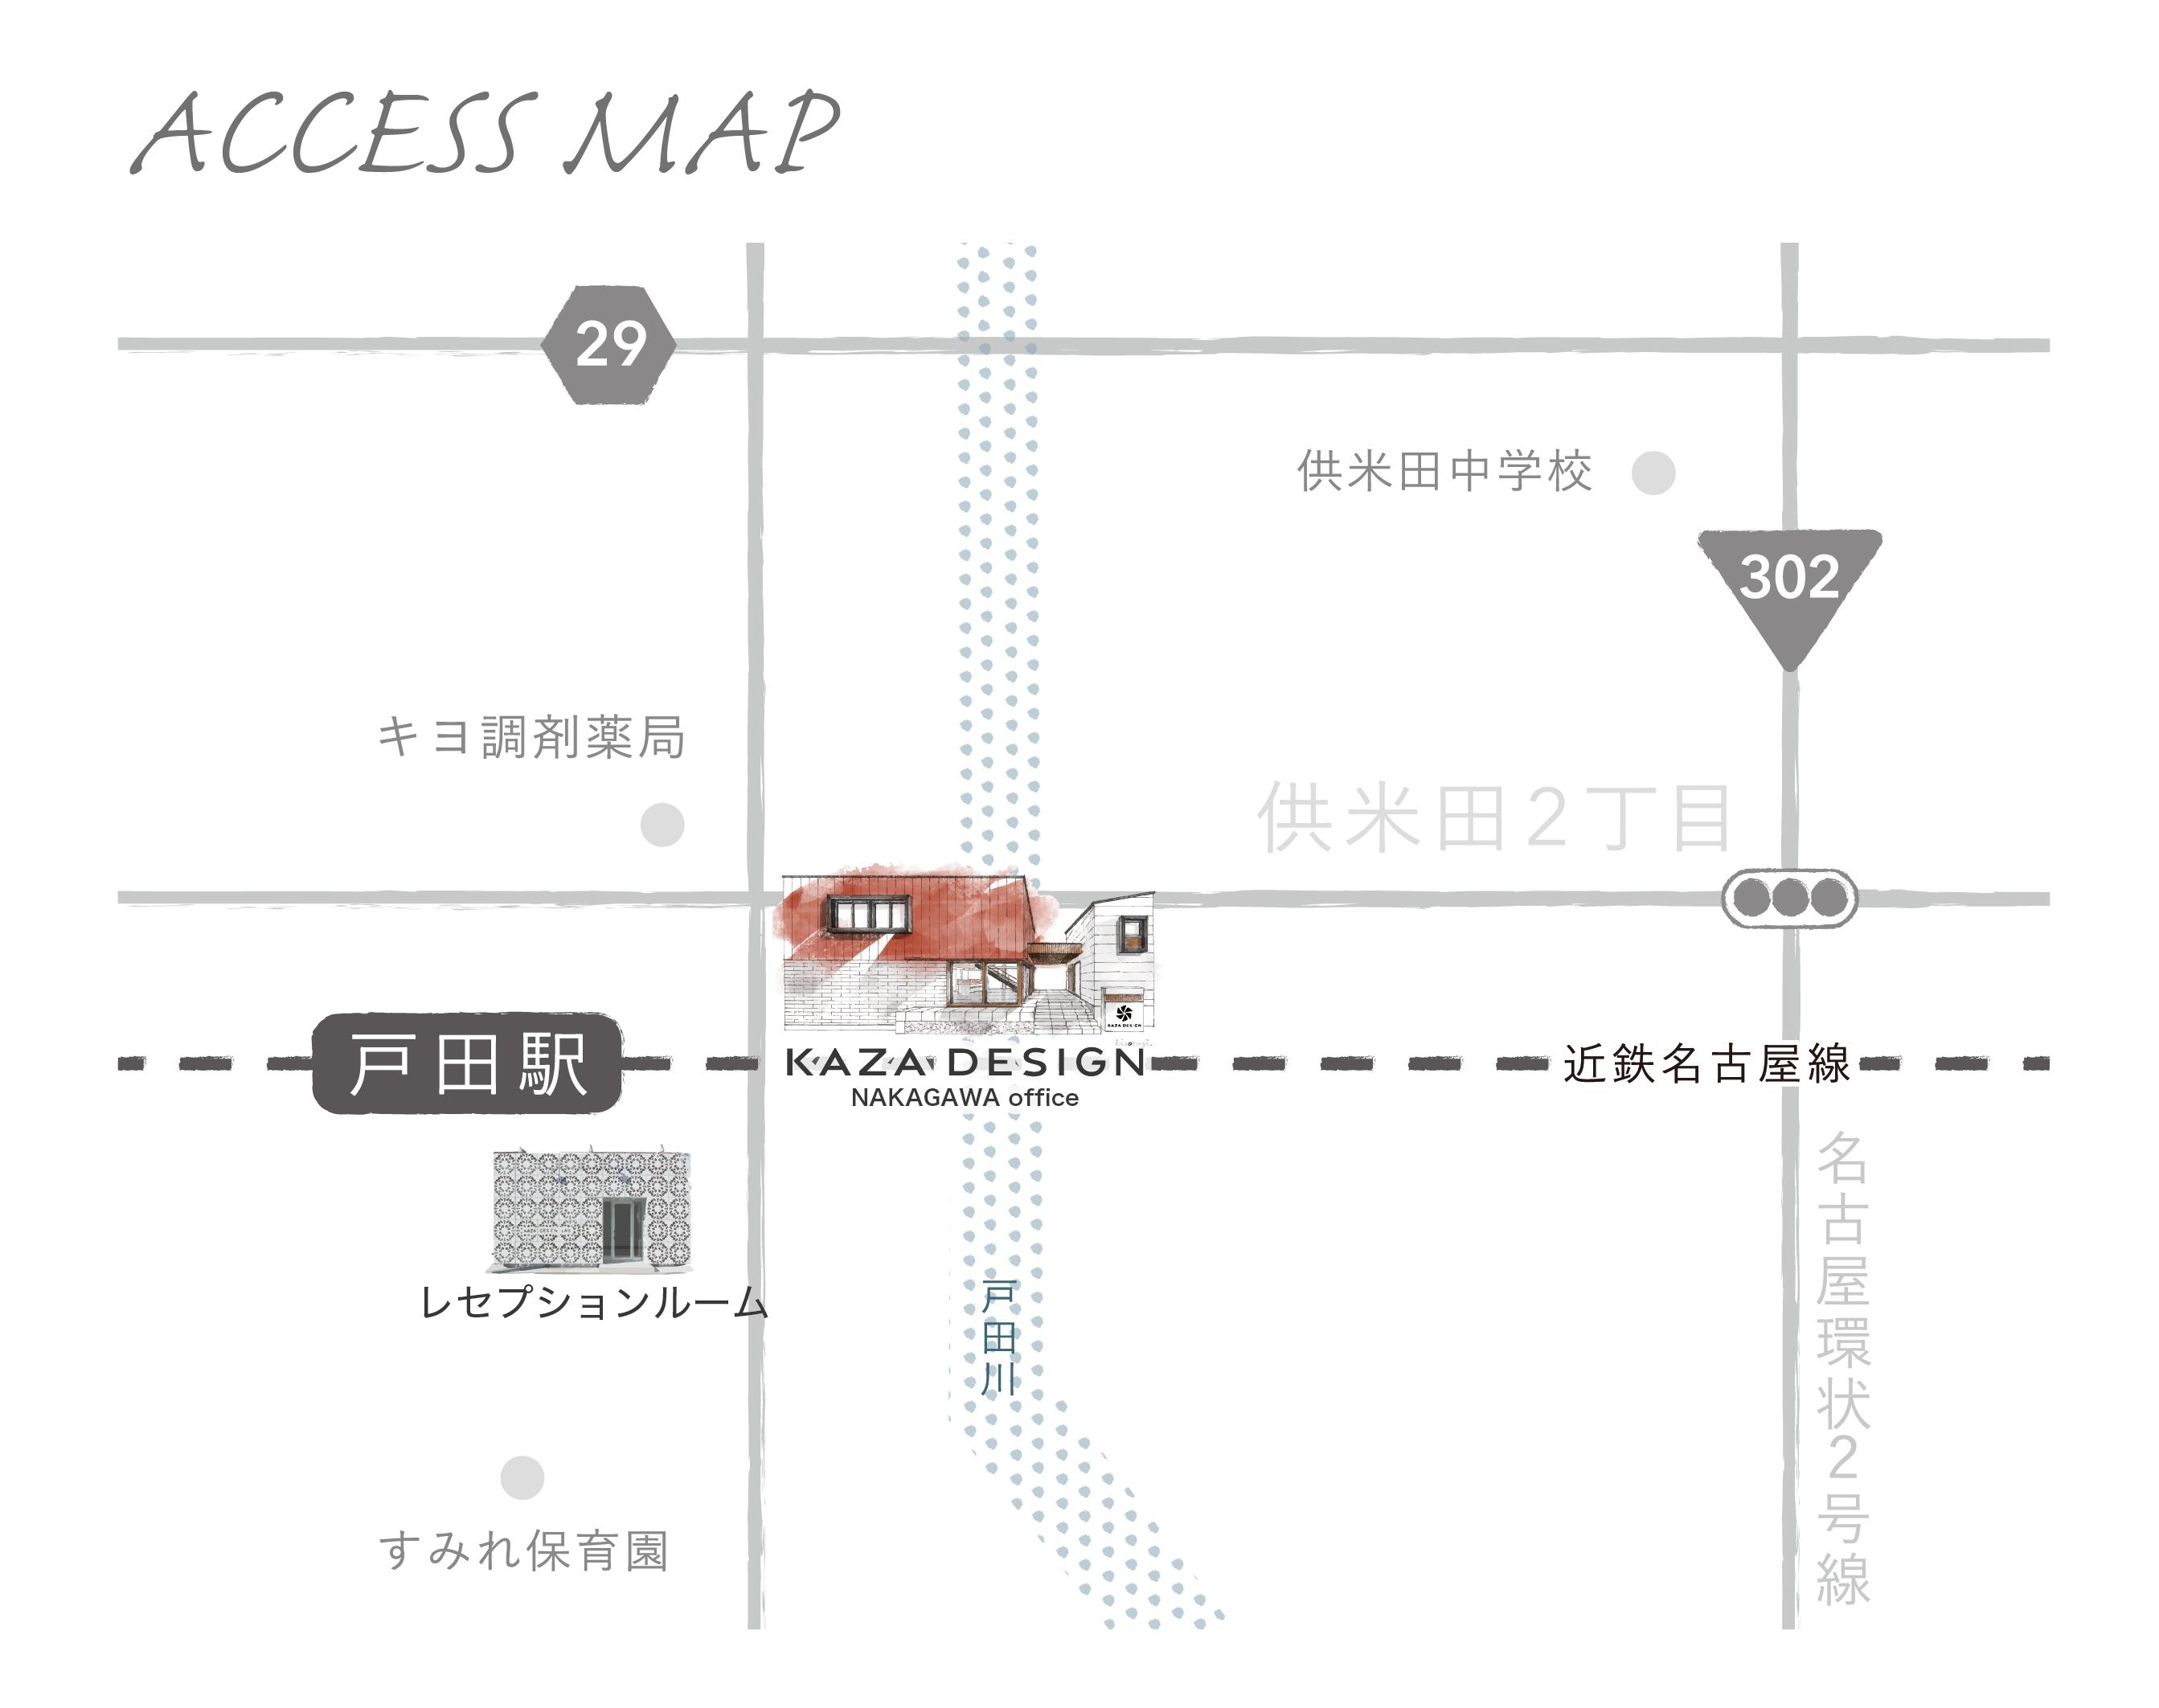 KAZA DESIGN中川本社のエントランス